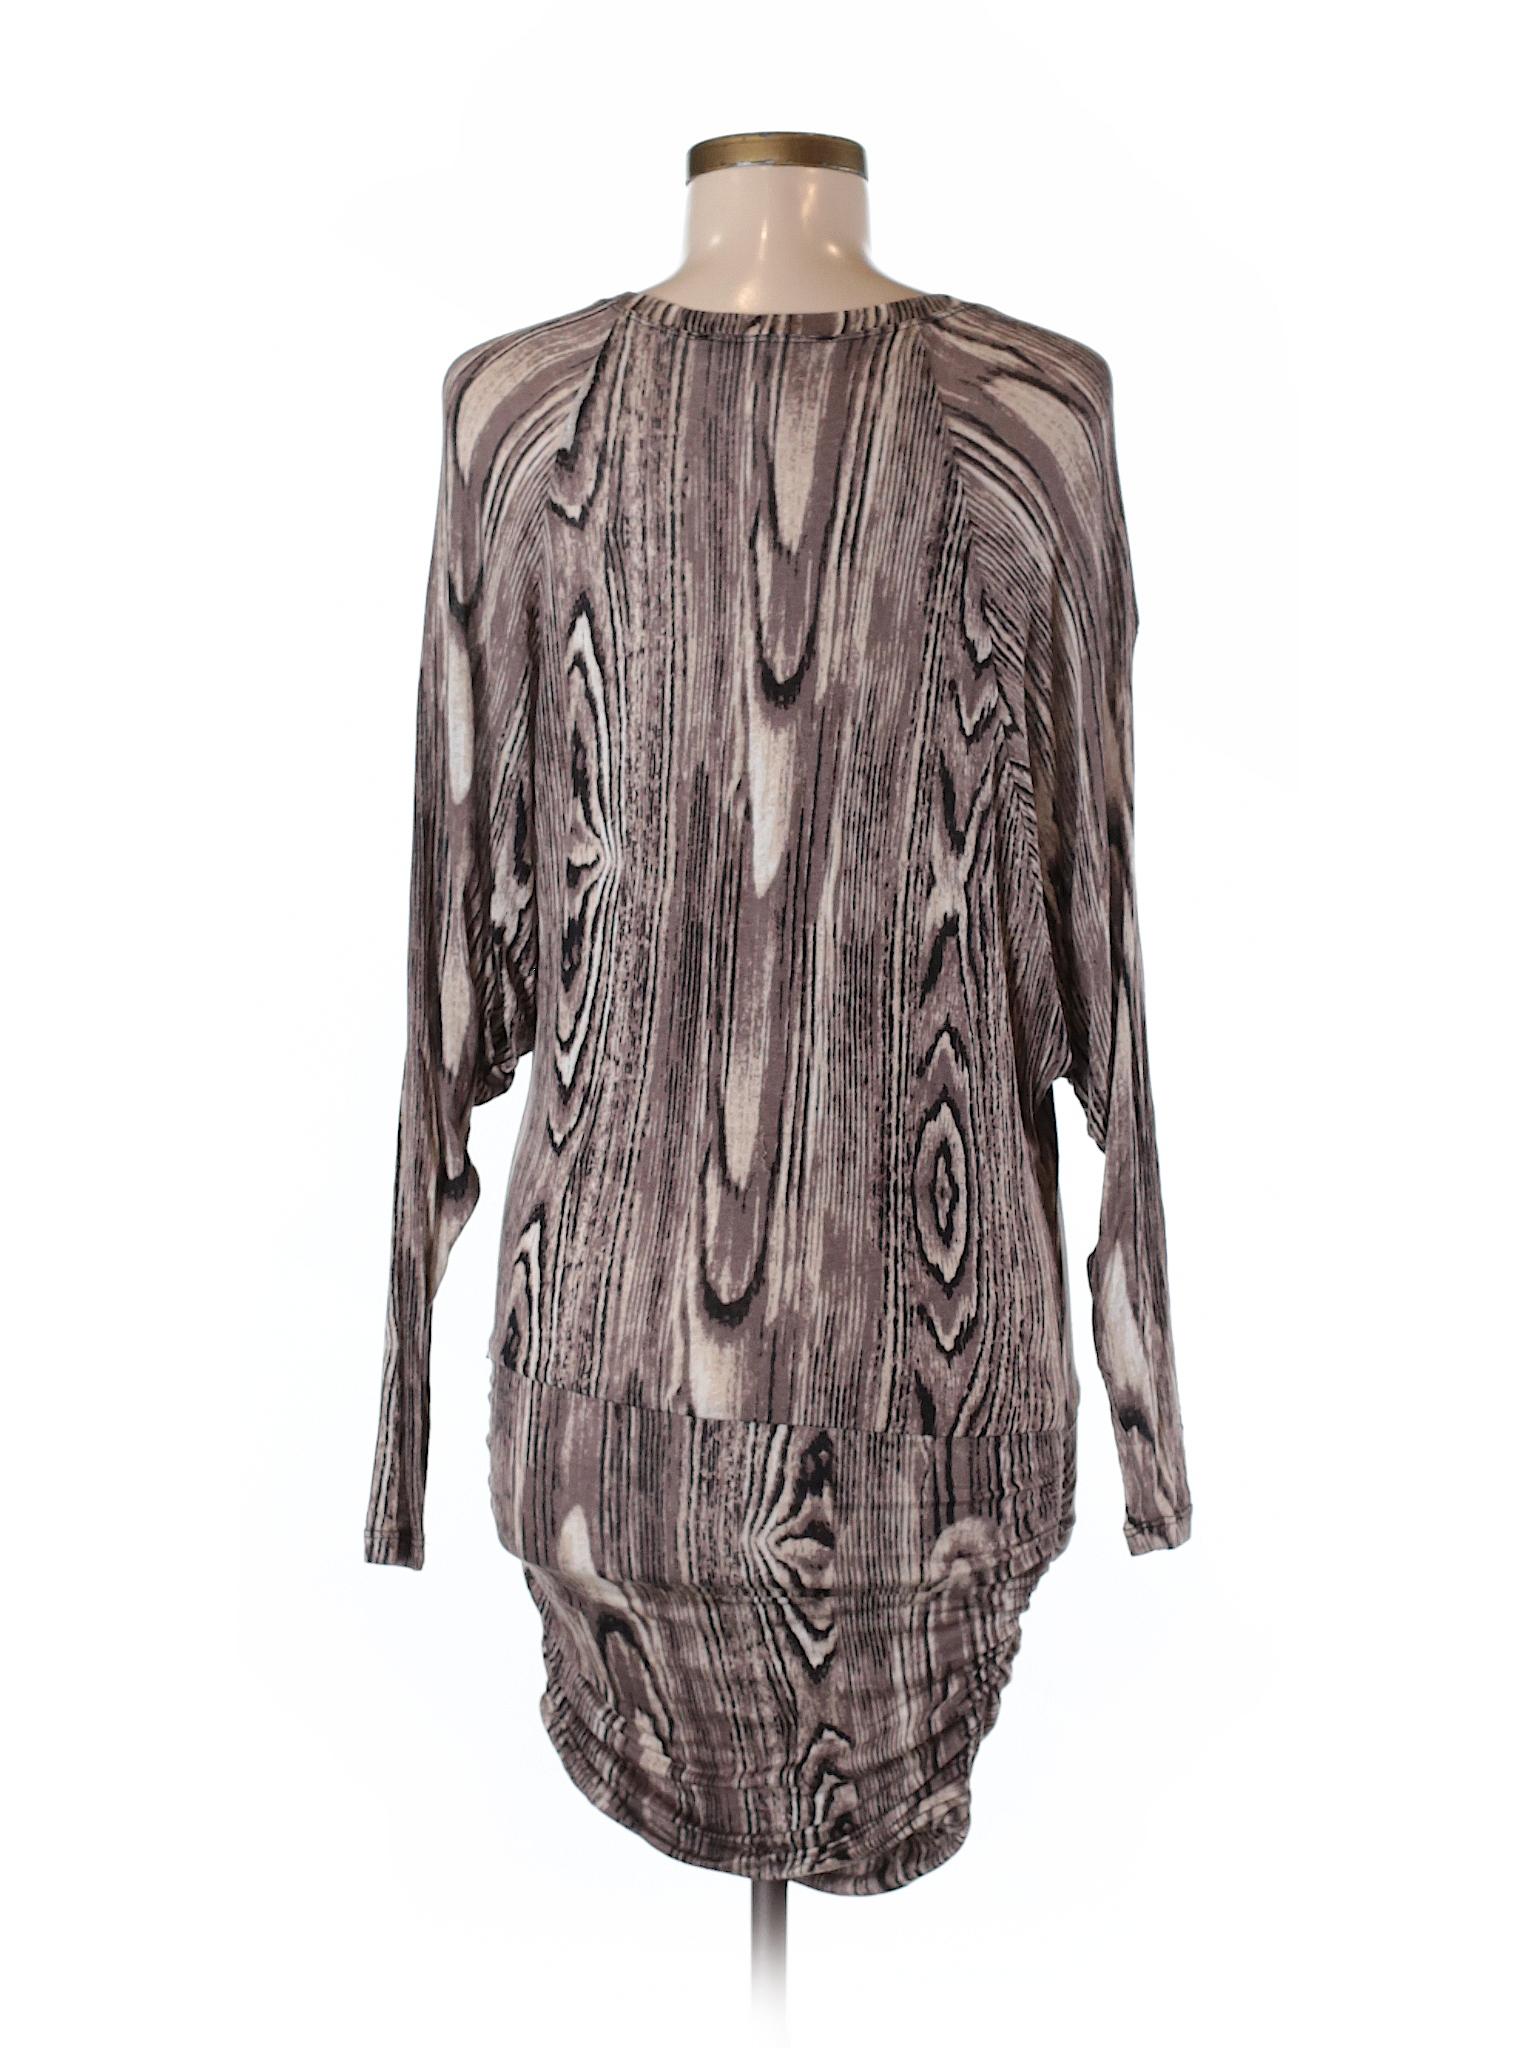 BCBGMAXAZRIA Casual Selling Casual Casual Dress Selling Dress Dress BCBGMAXAZRIA Selling BCBGMAXAZRIA wYgRqR